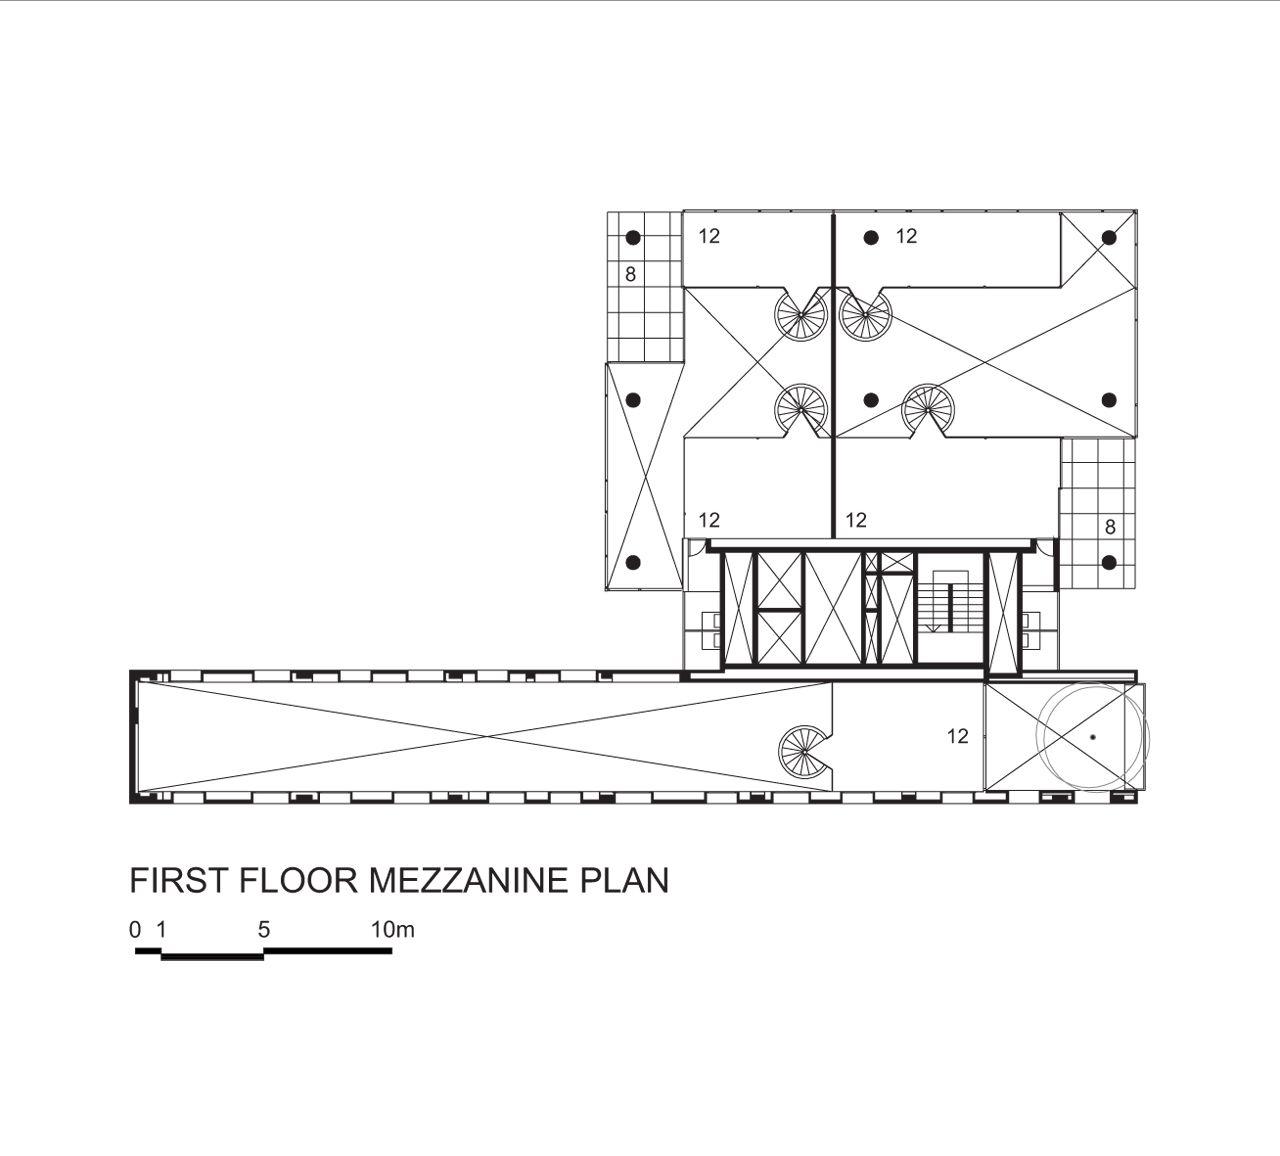 galeria de edificio w305 isay weinfeld 1 explore mezzanine floor plans and more